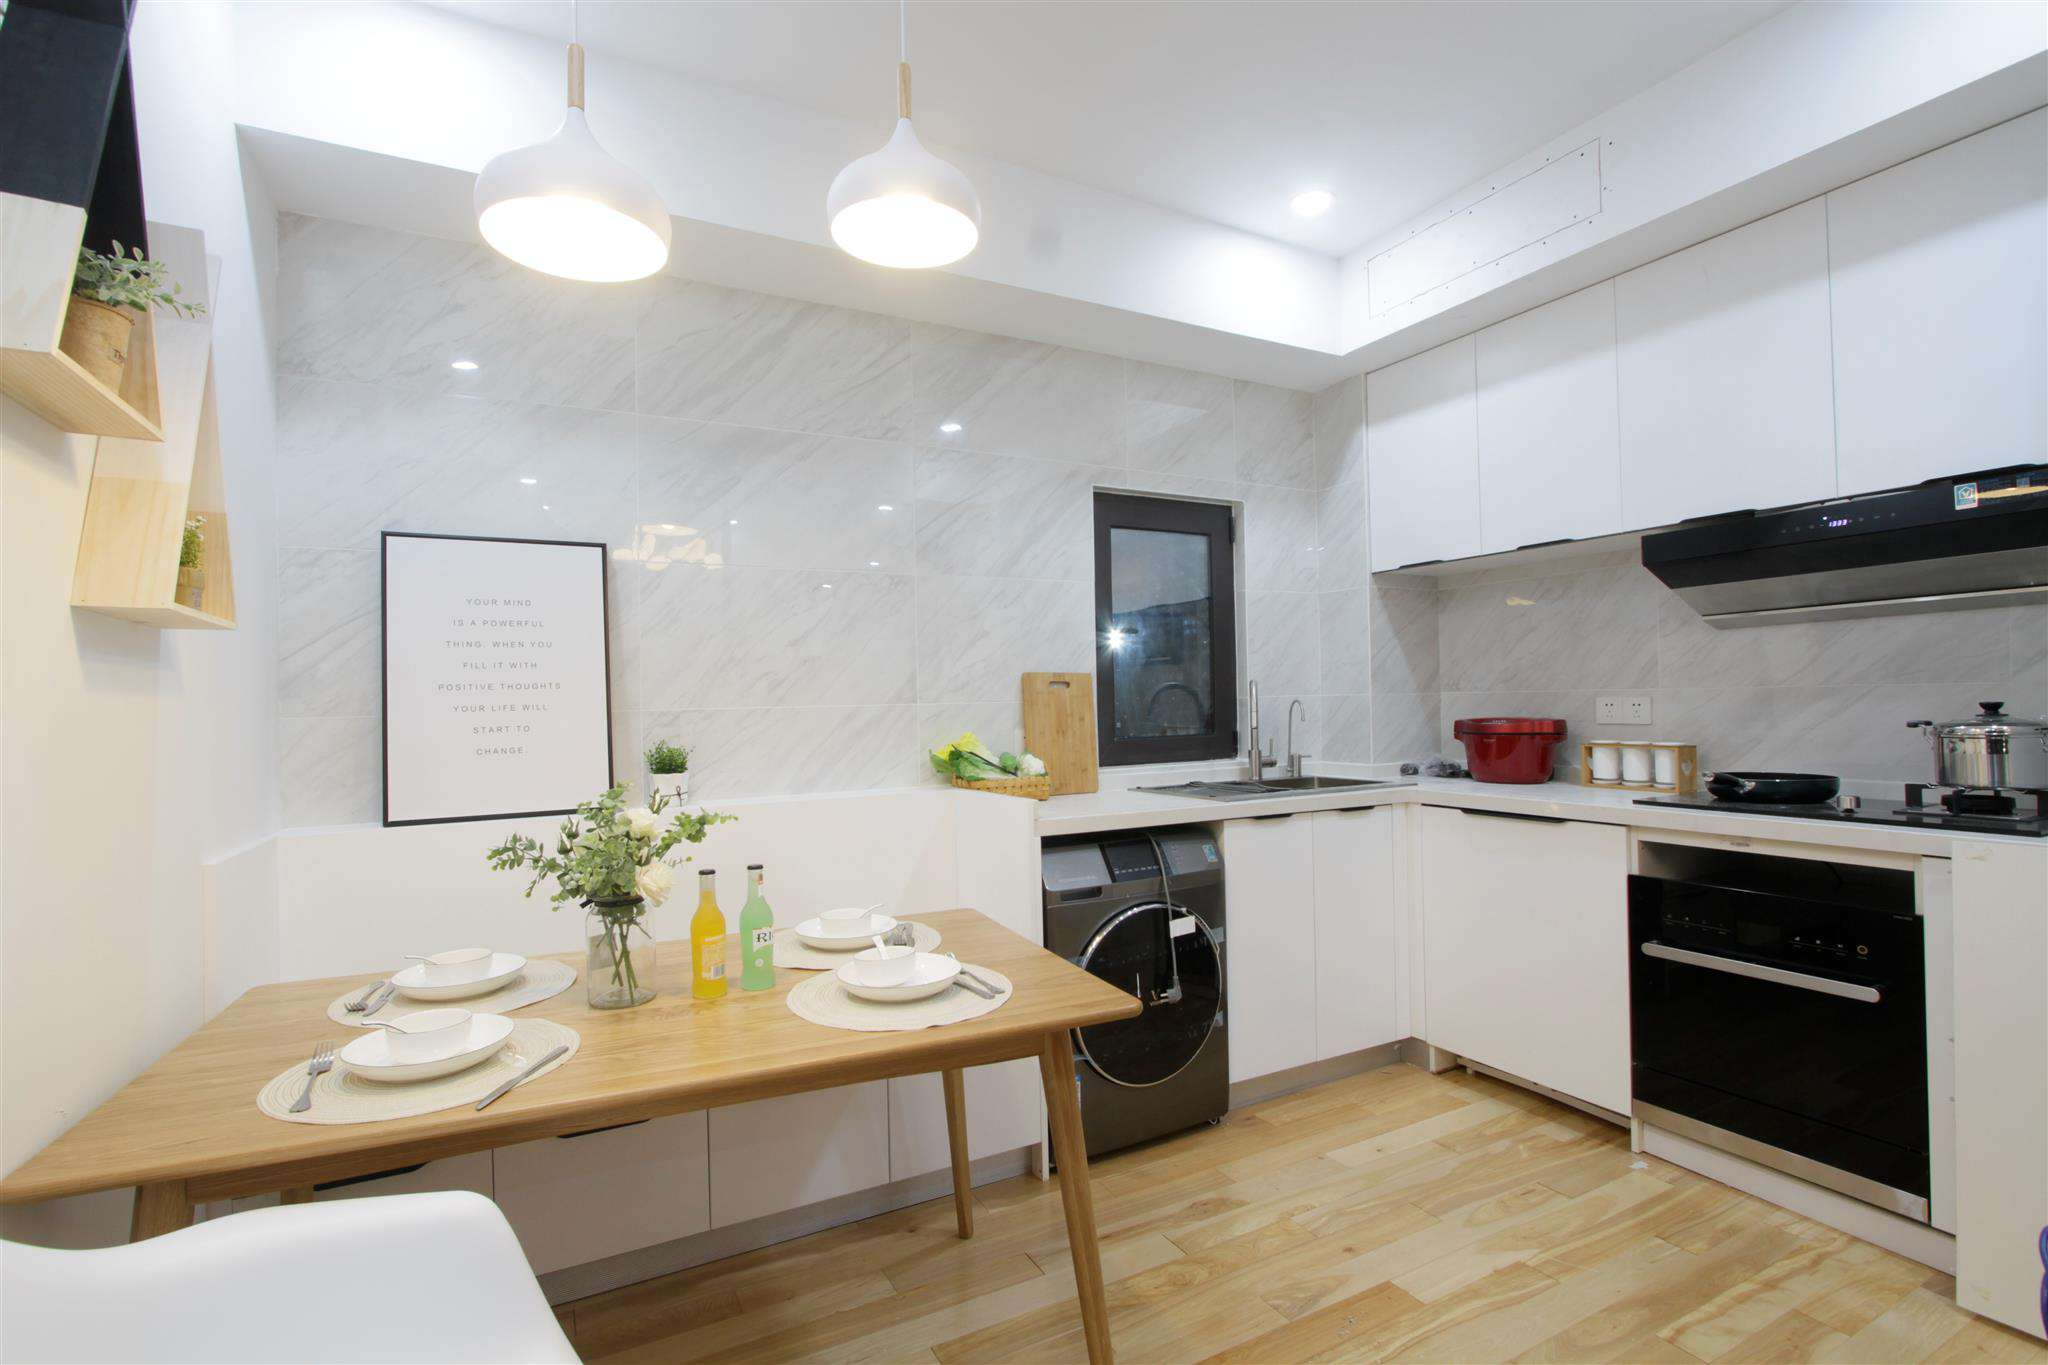 Finished Interior, kitchen